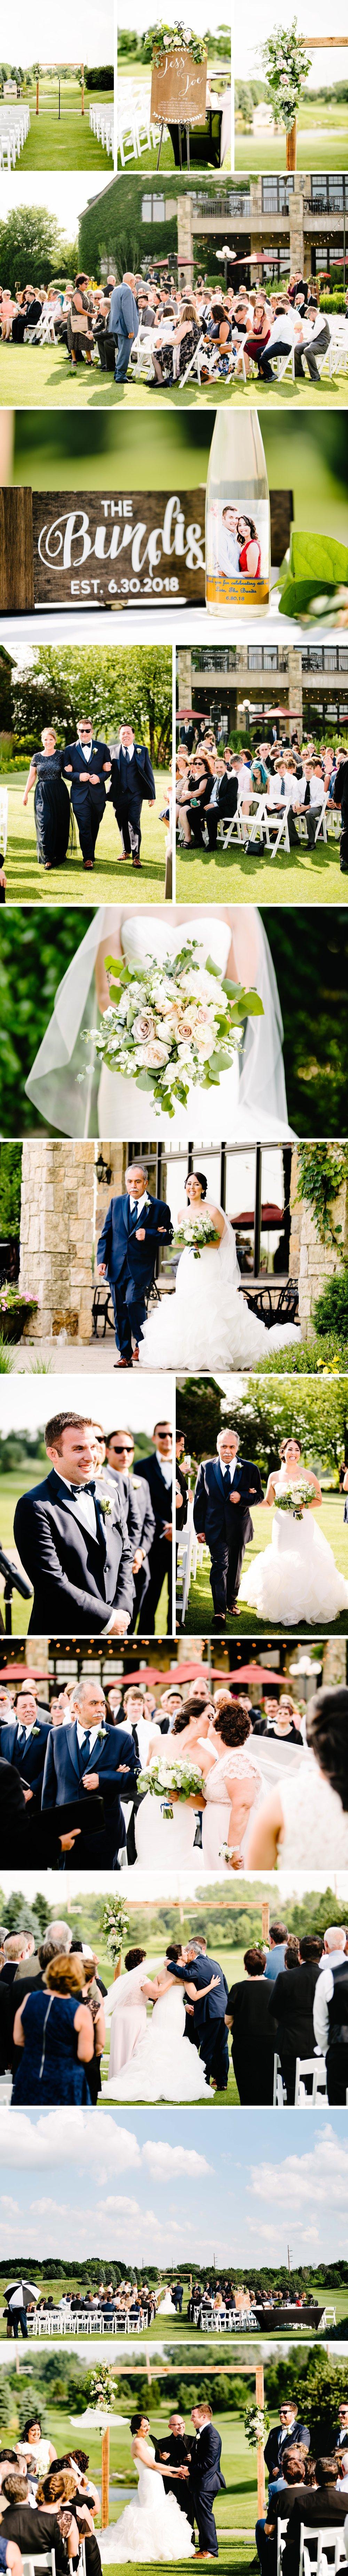 chicago-fine-art-wedding-photography-burdi4